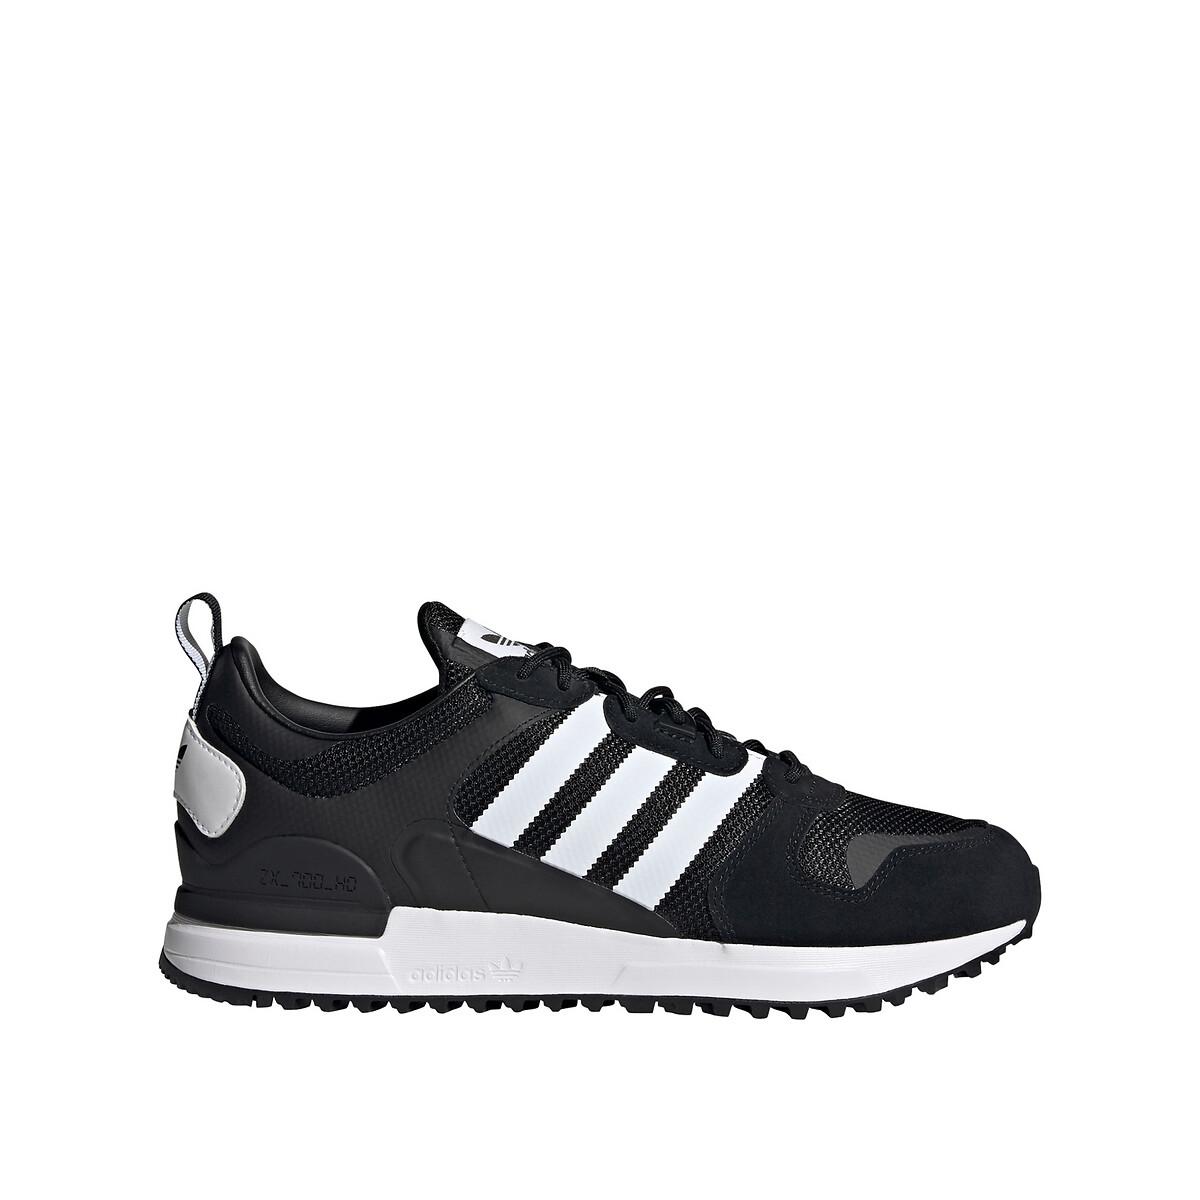 Adidas Originals ZX 700 HD Heren Core Black / Cloud White / Core Black Dames online kopen